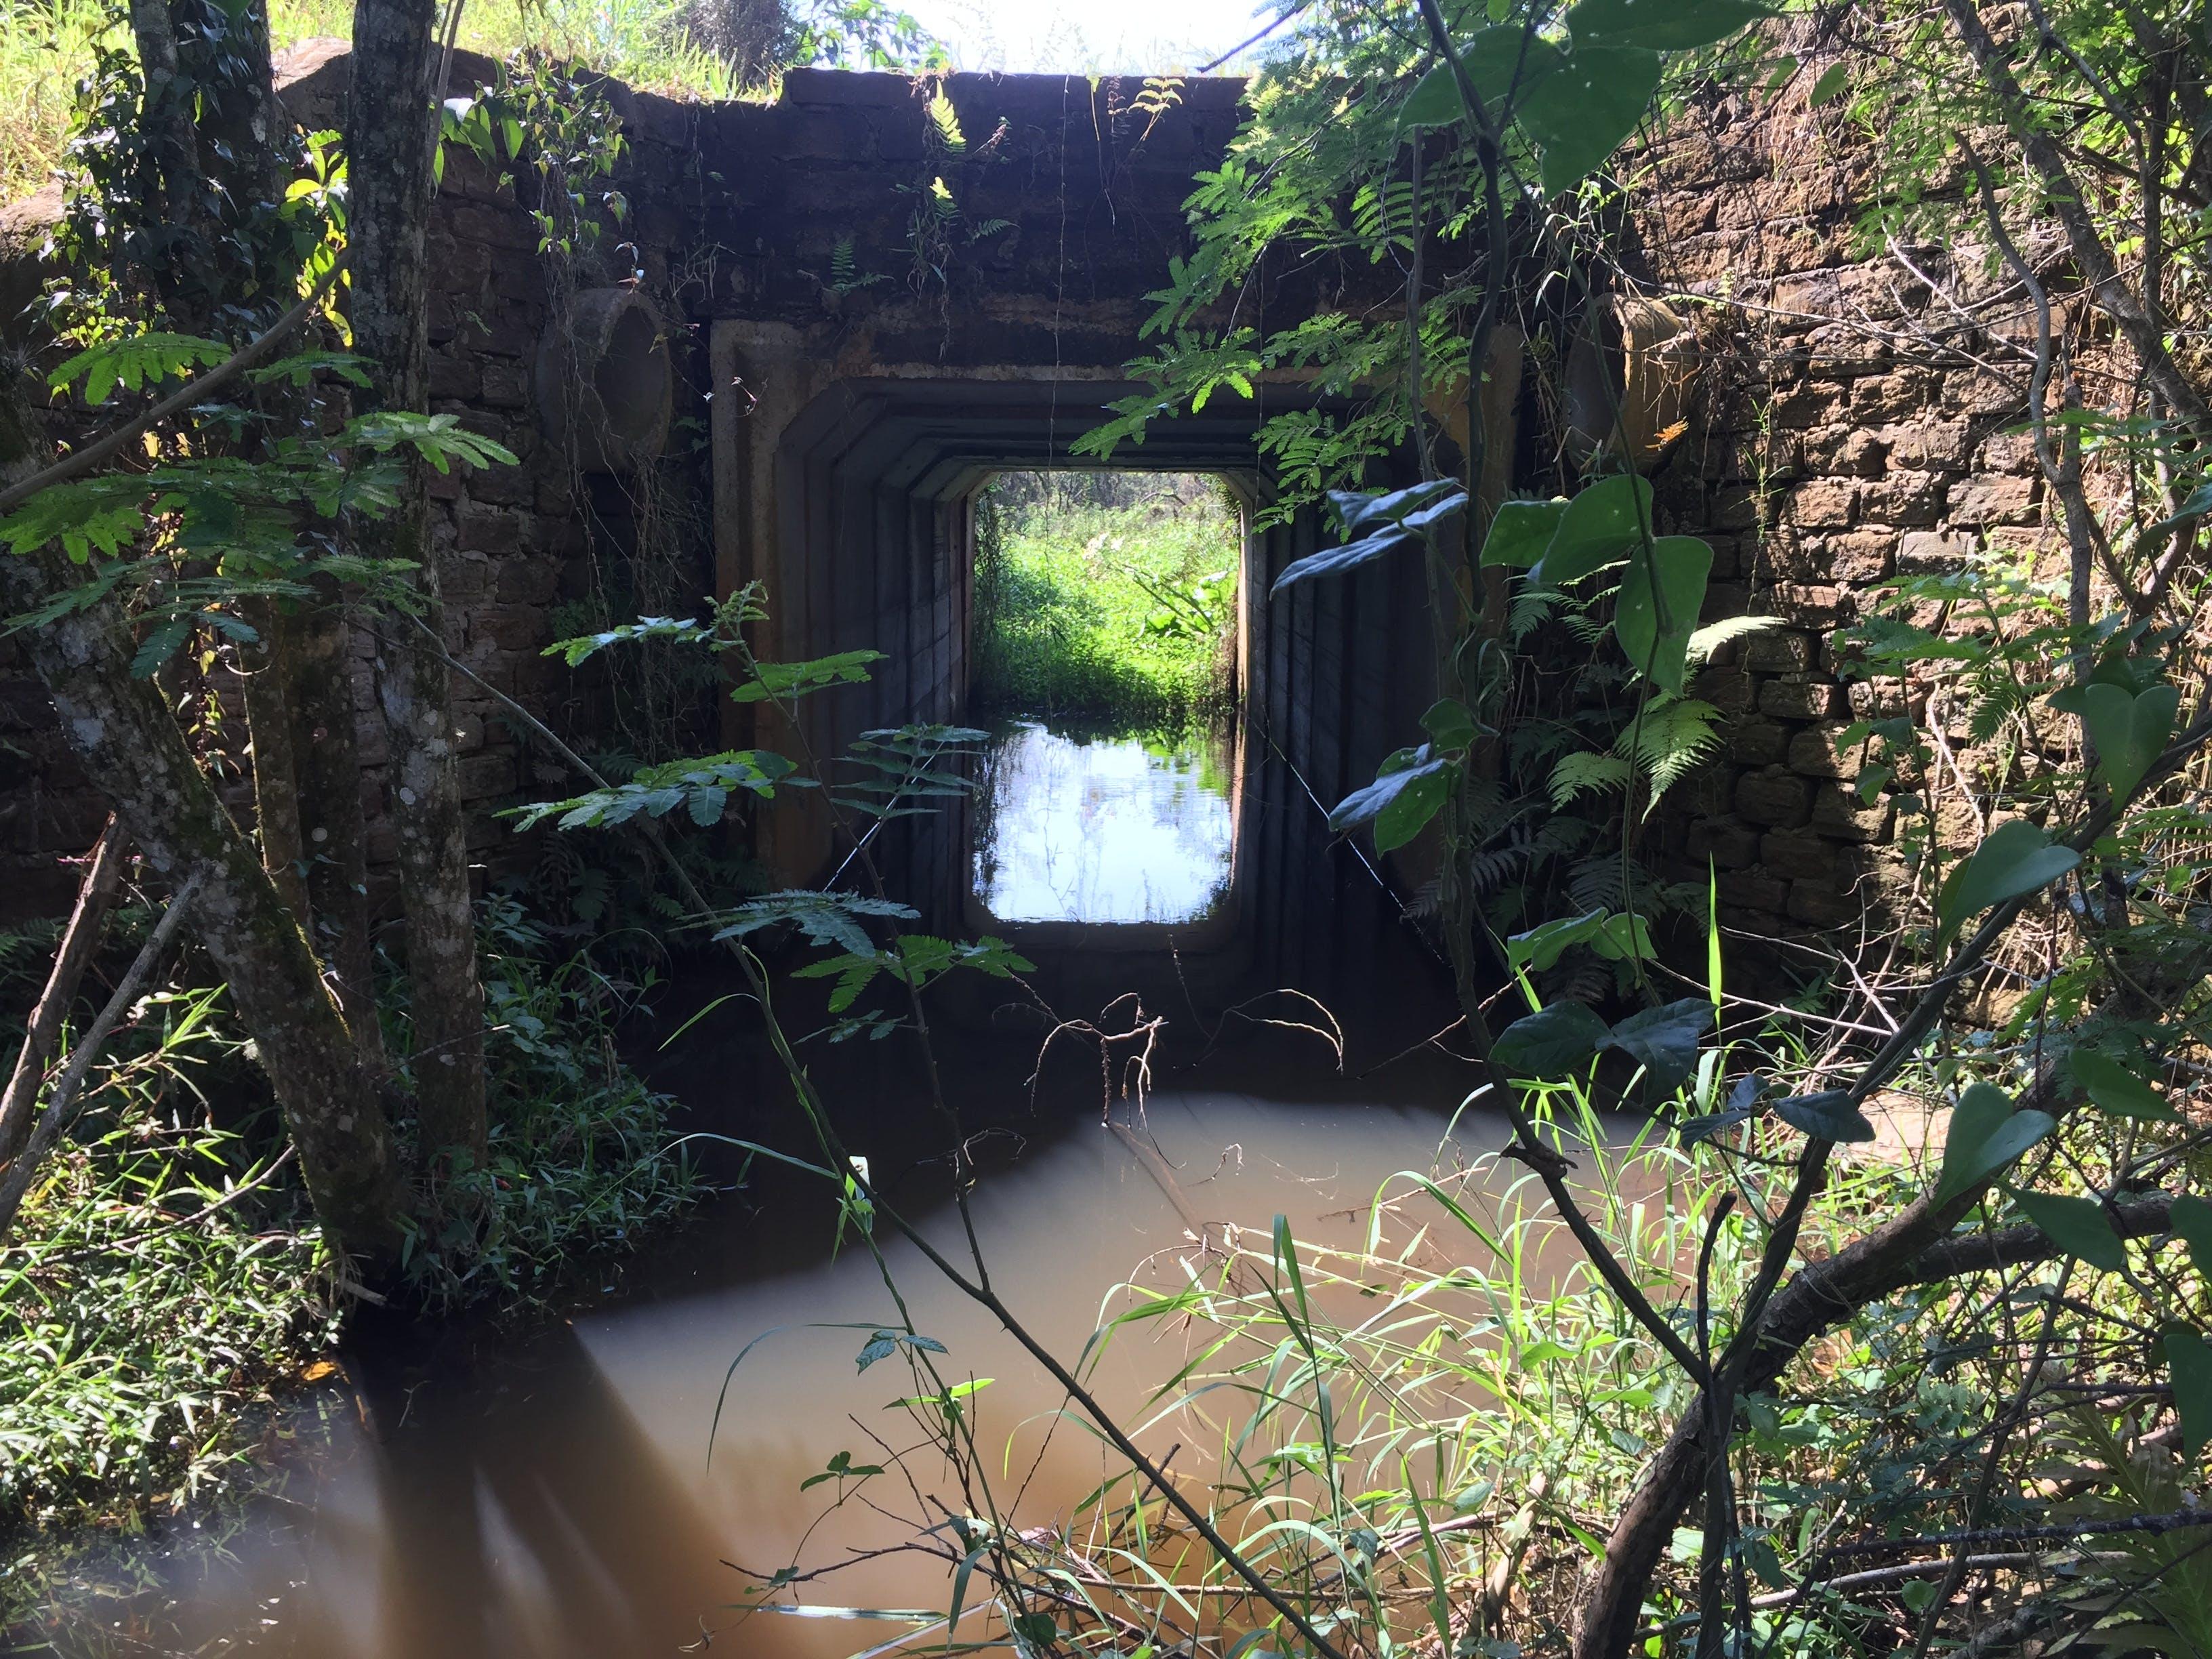 bridge, calm waters, nature